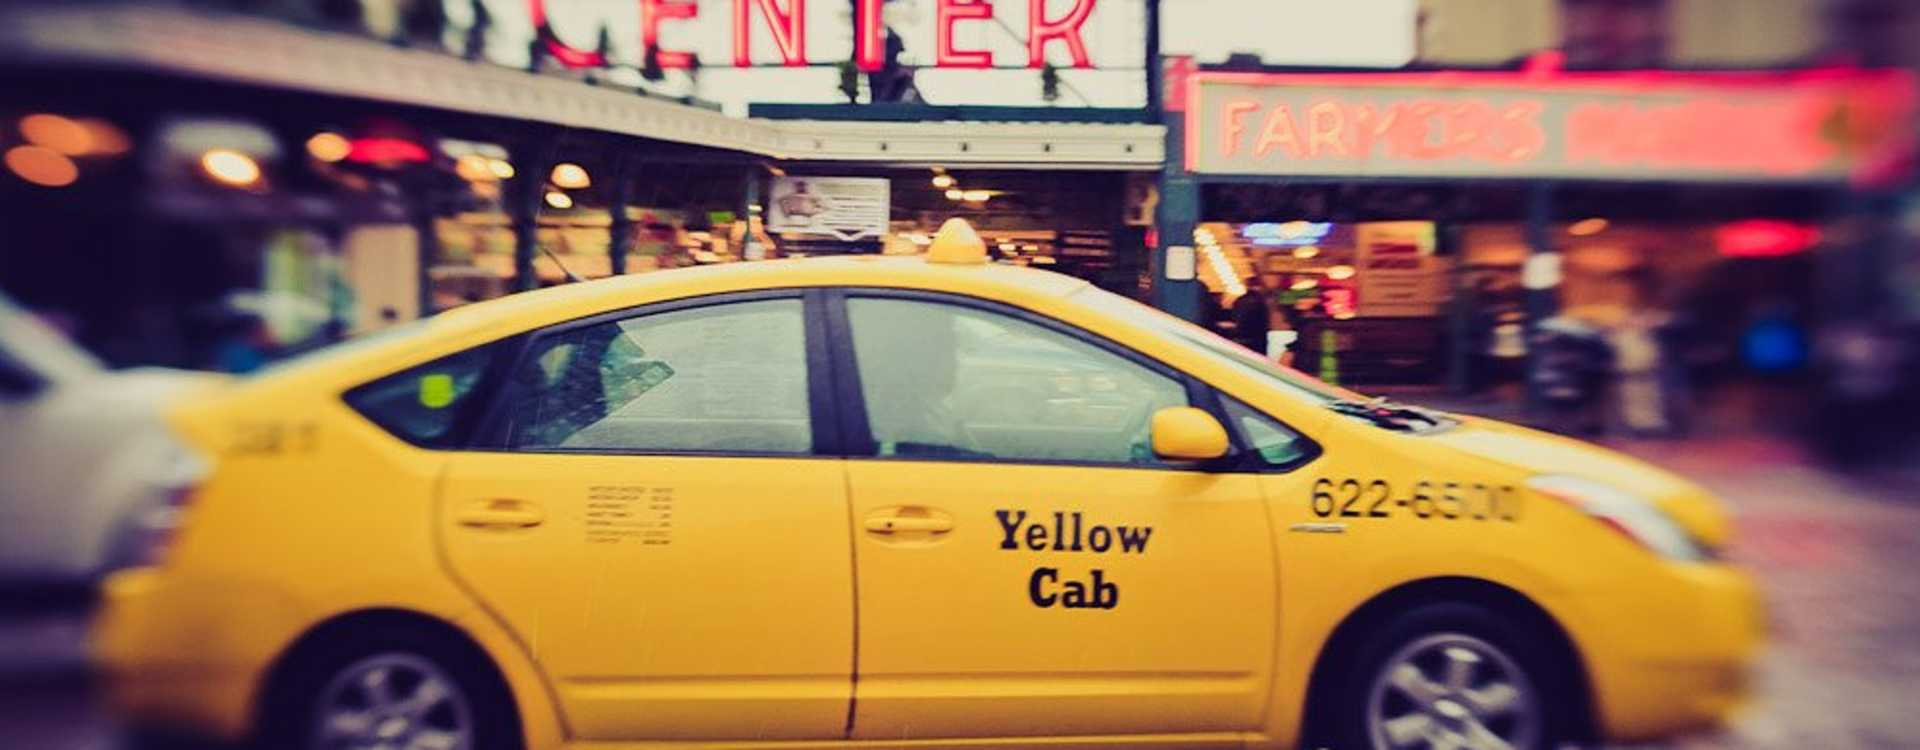 Yellow_Cab-3.jpg